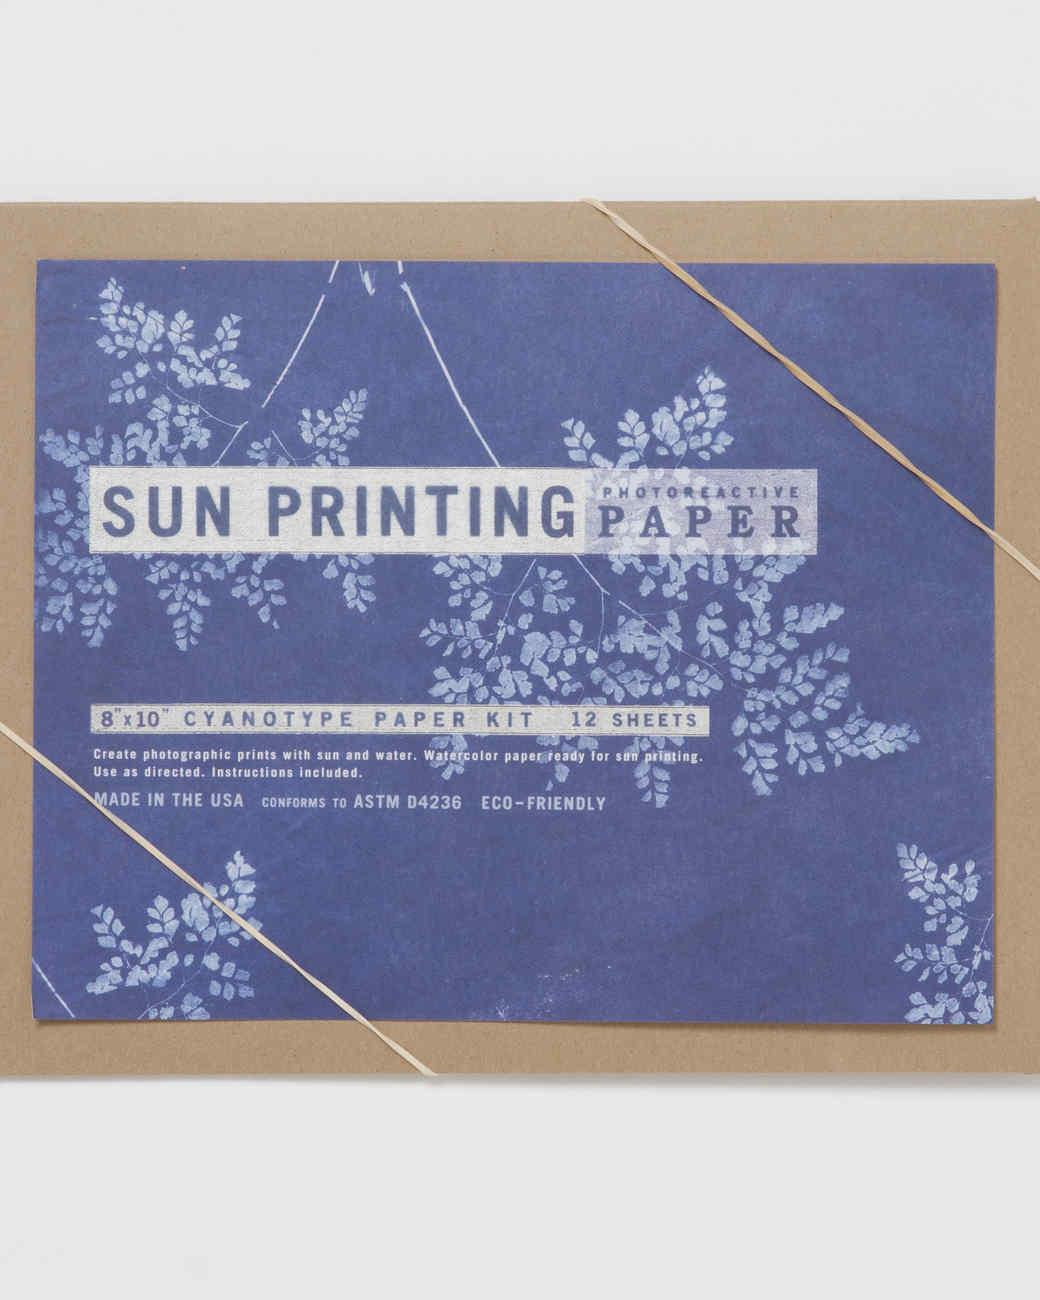 sunprinting paper